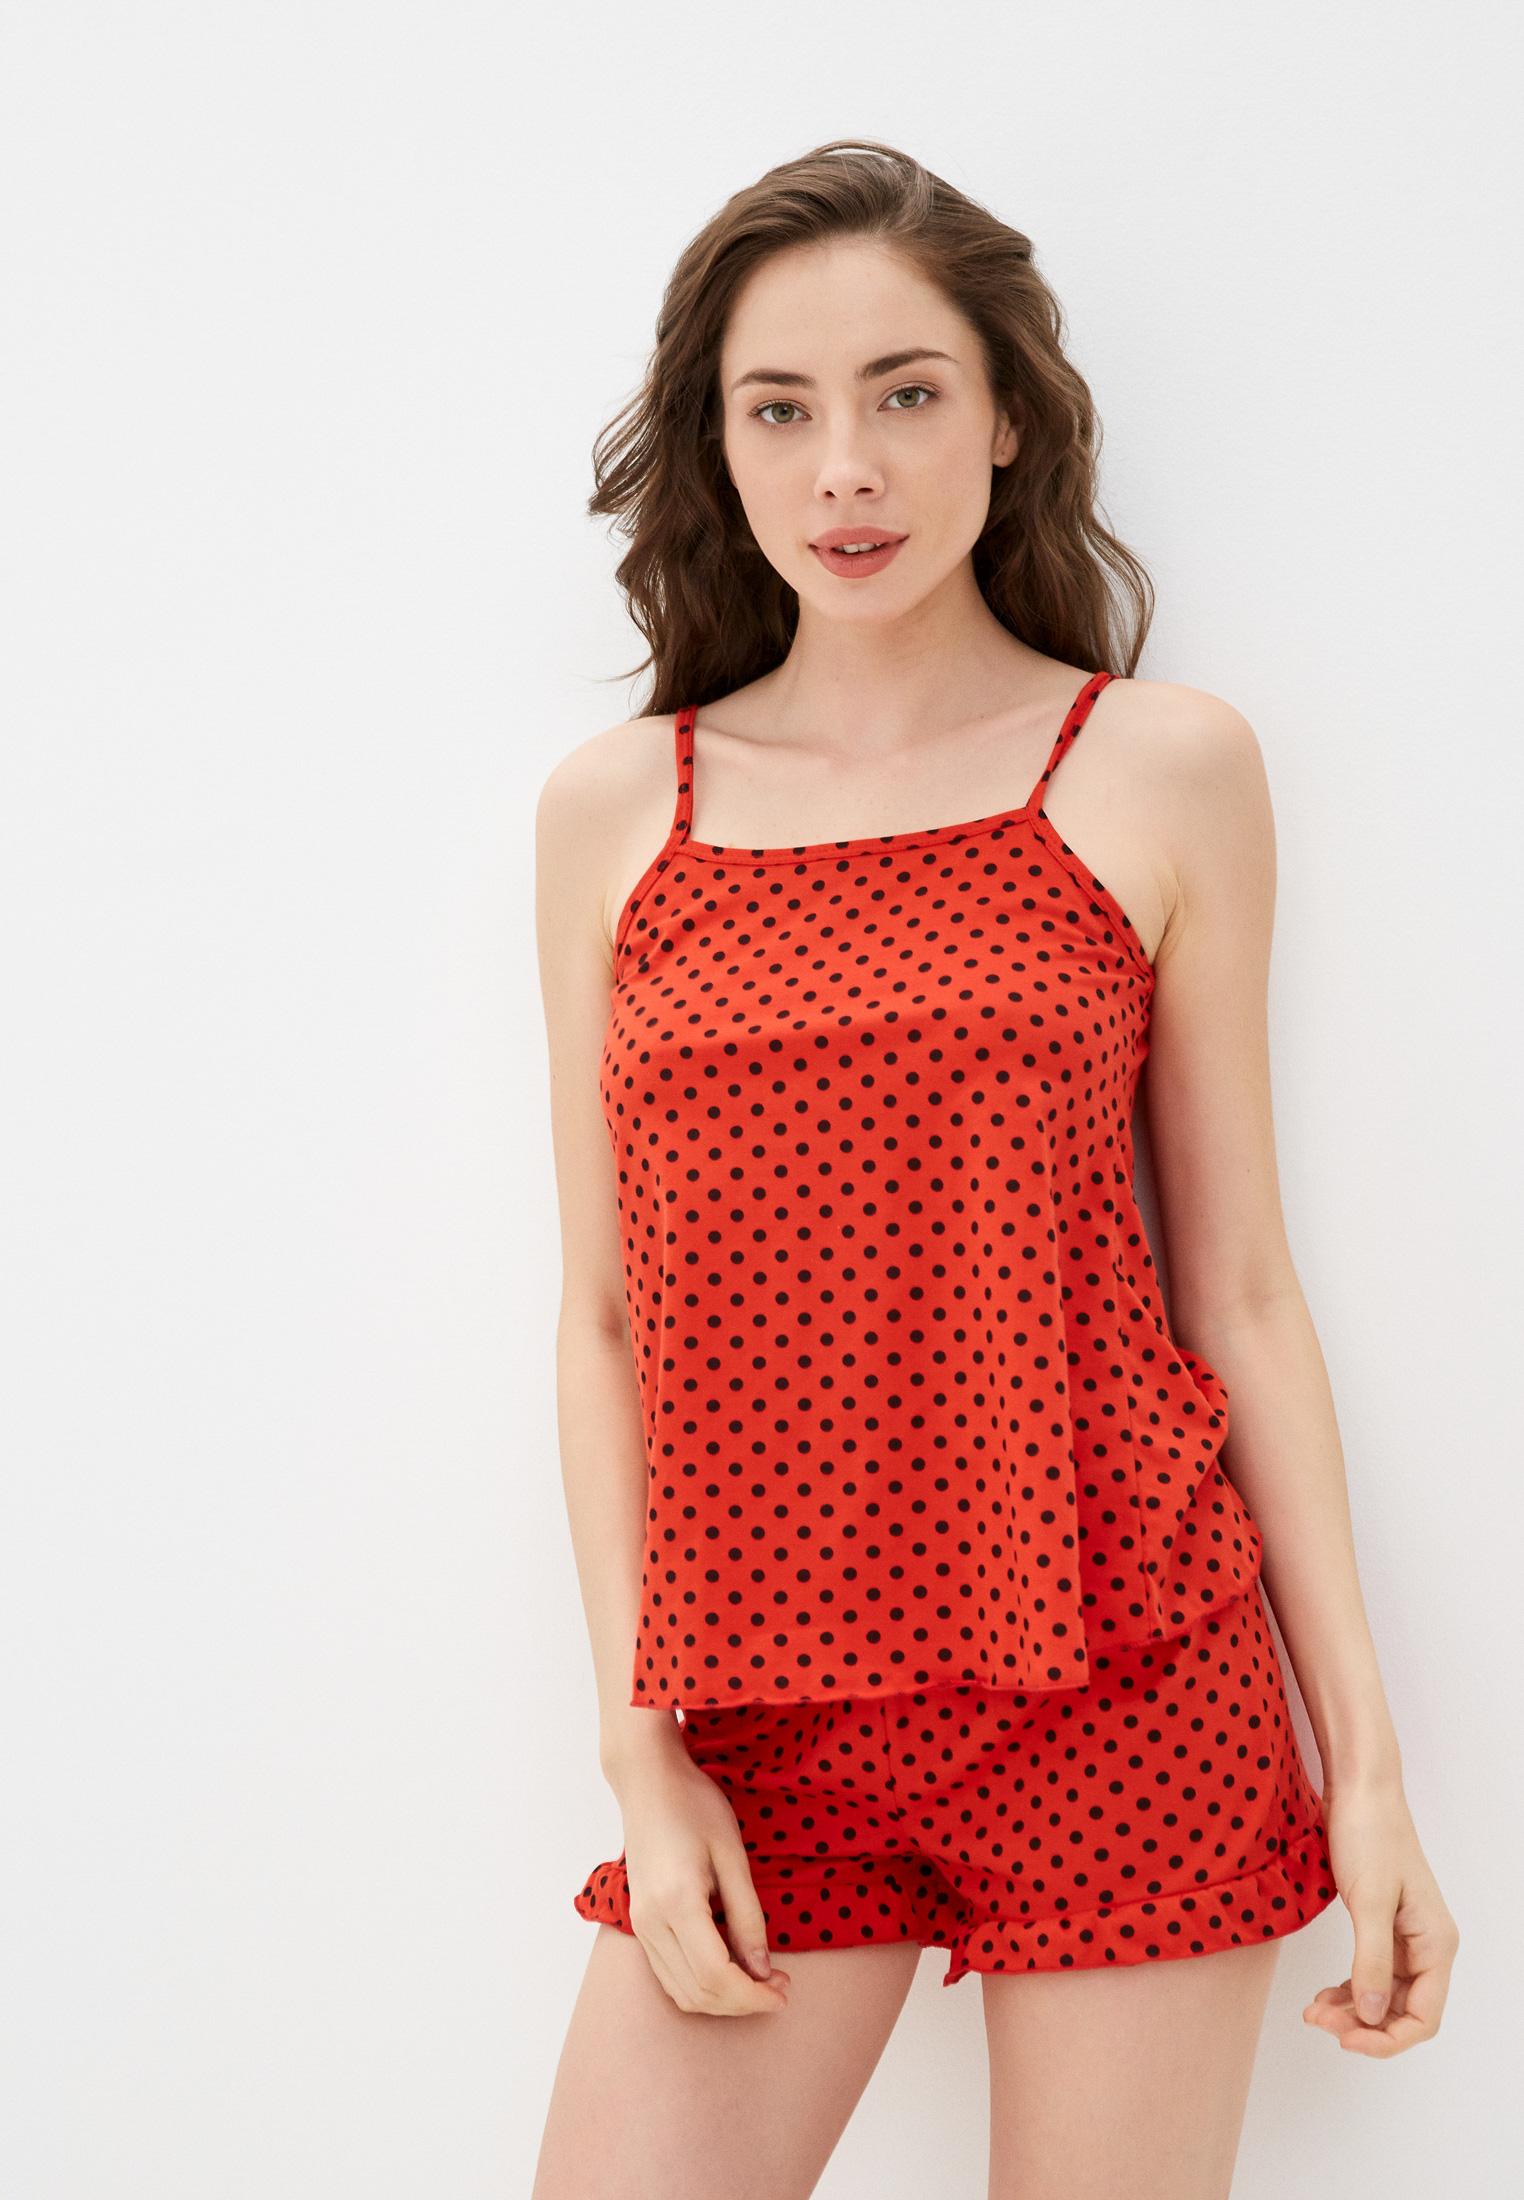 Женское белье и одежда для дома Rene Santi Пижама Rene Santi